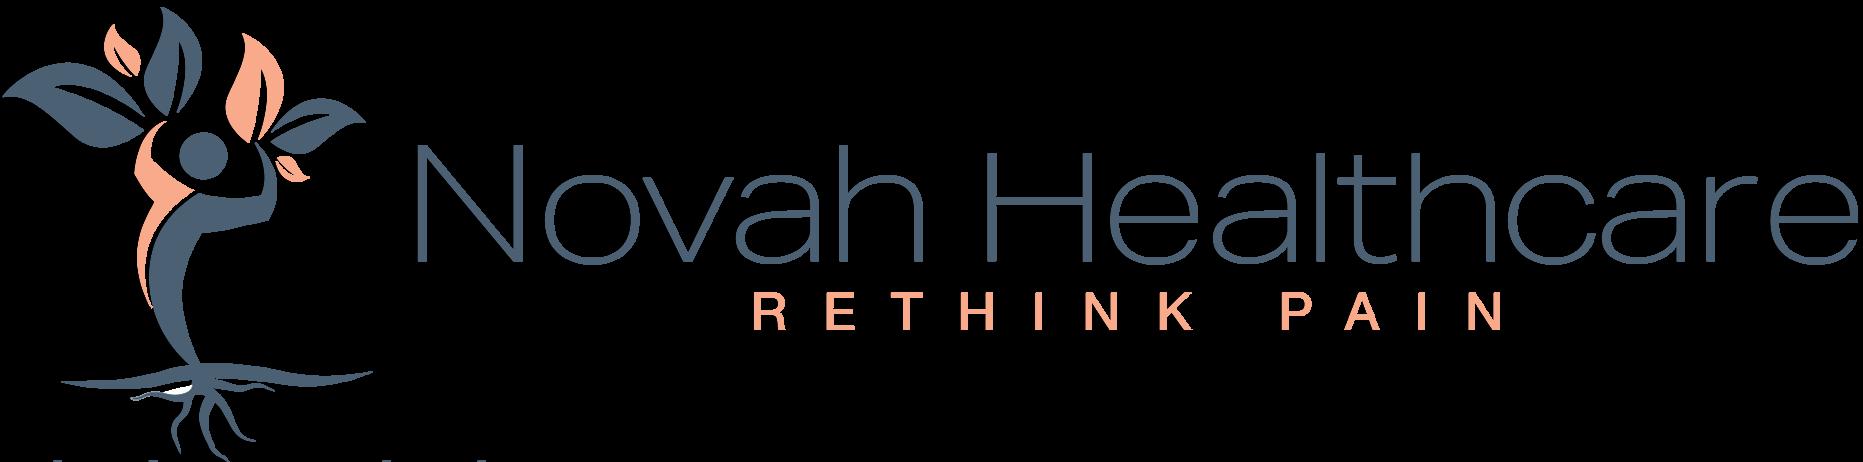 Novah Healthcare